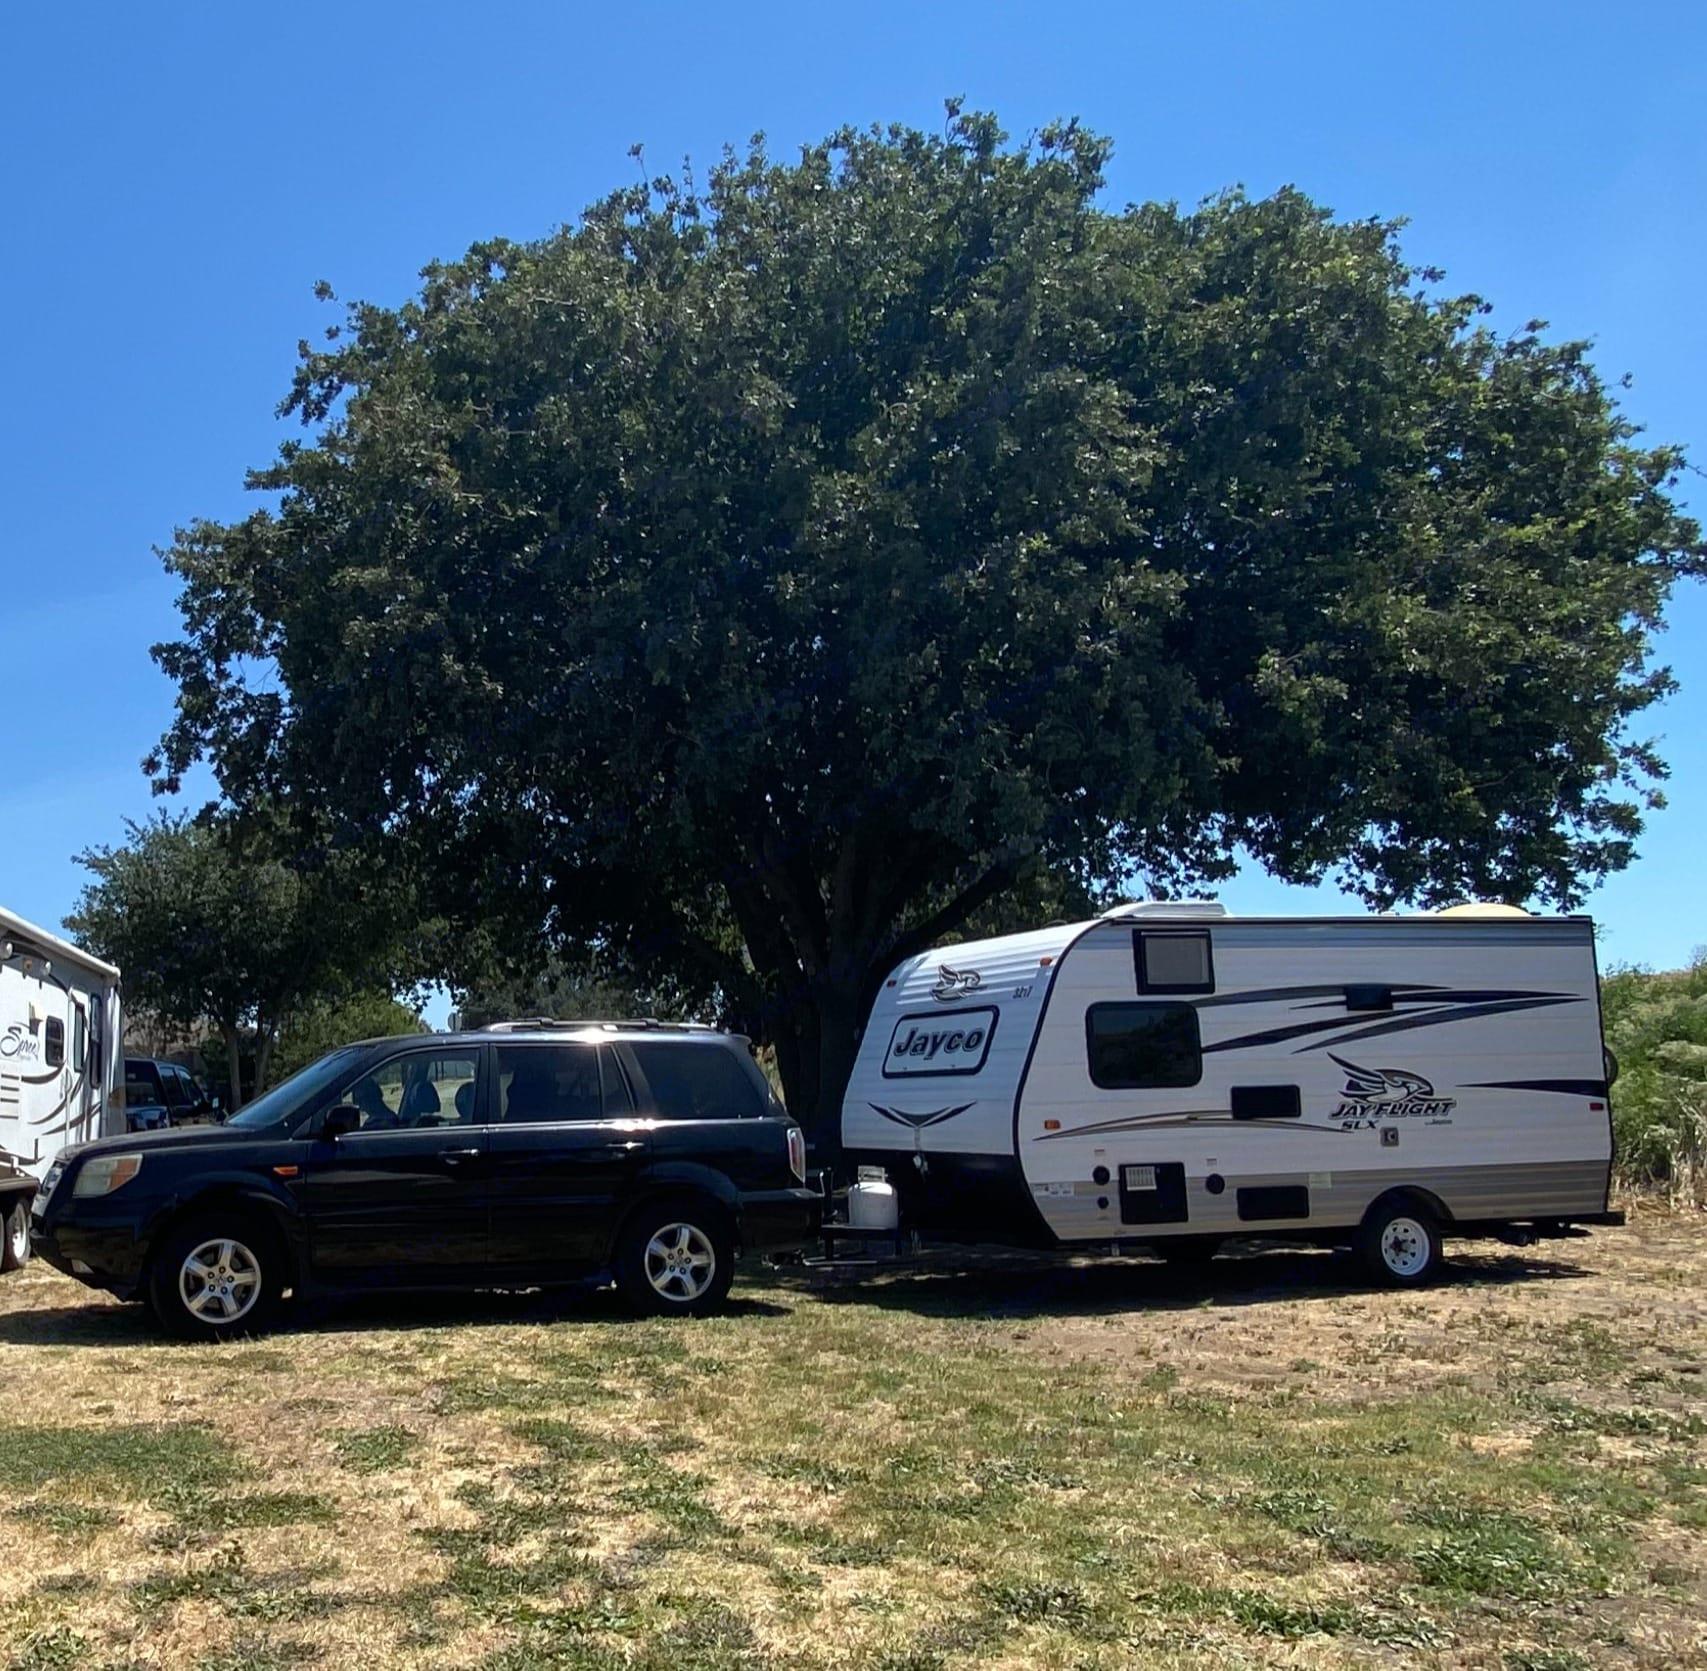 Camping at the Meadows of Isleton. Jayco Jay Flight 154BH 2016